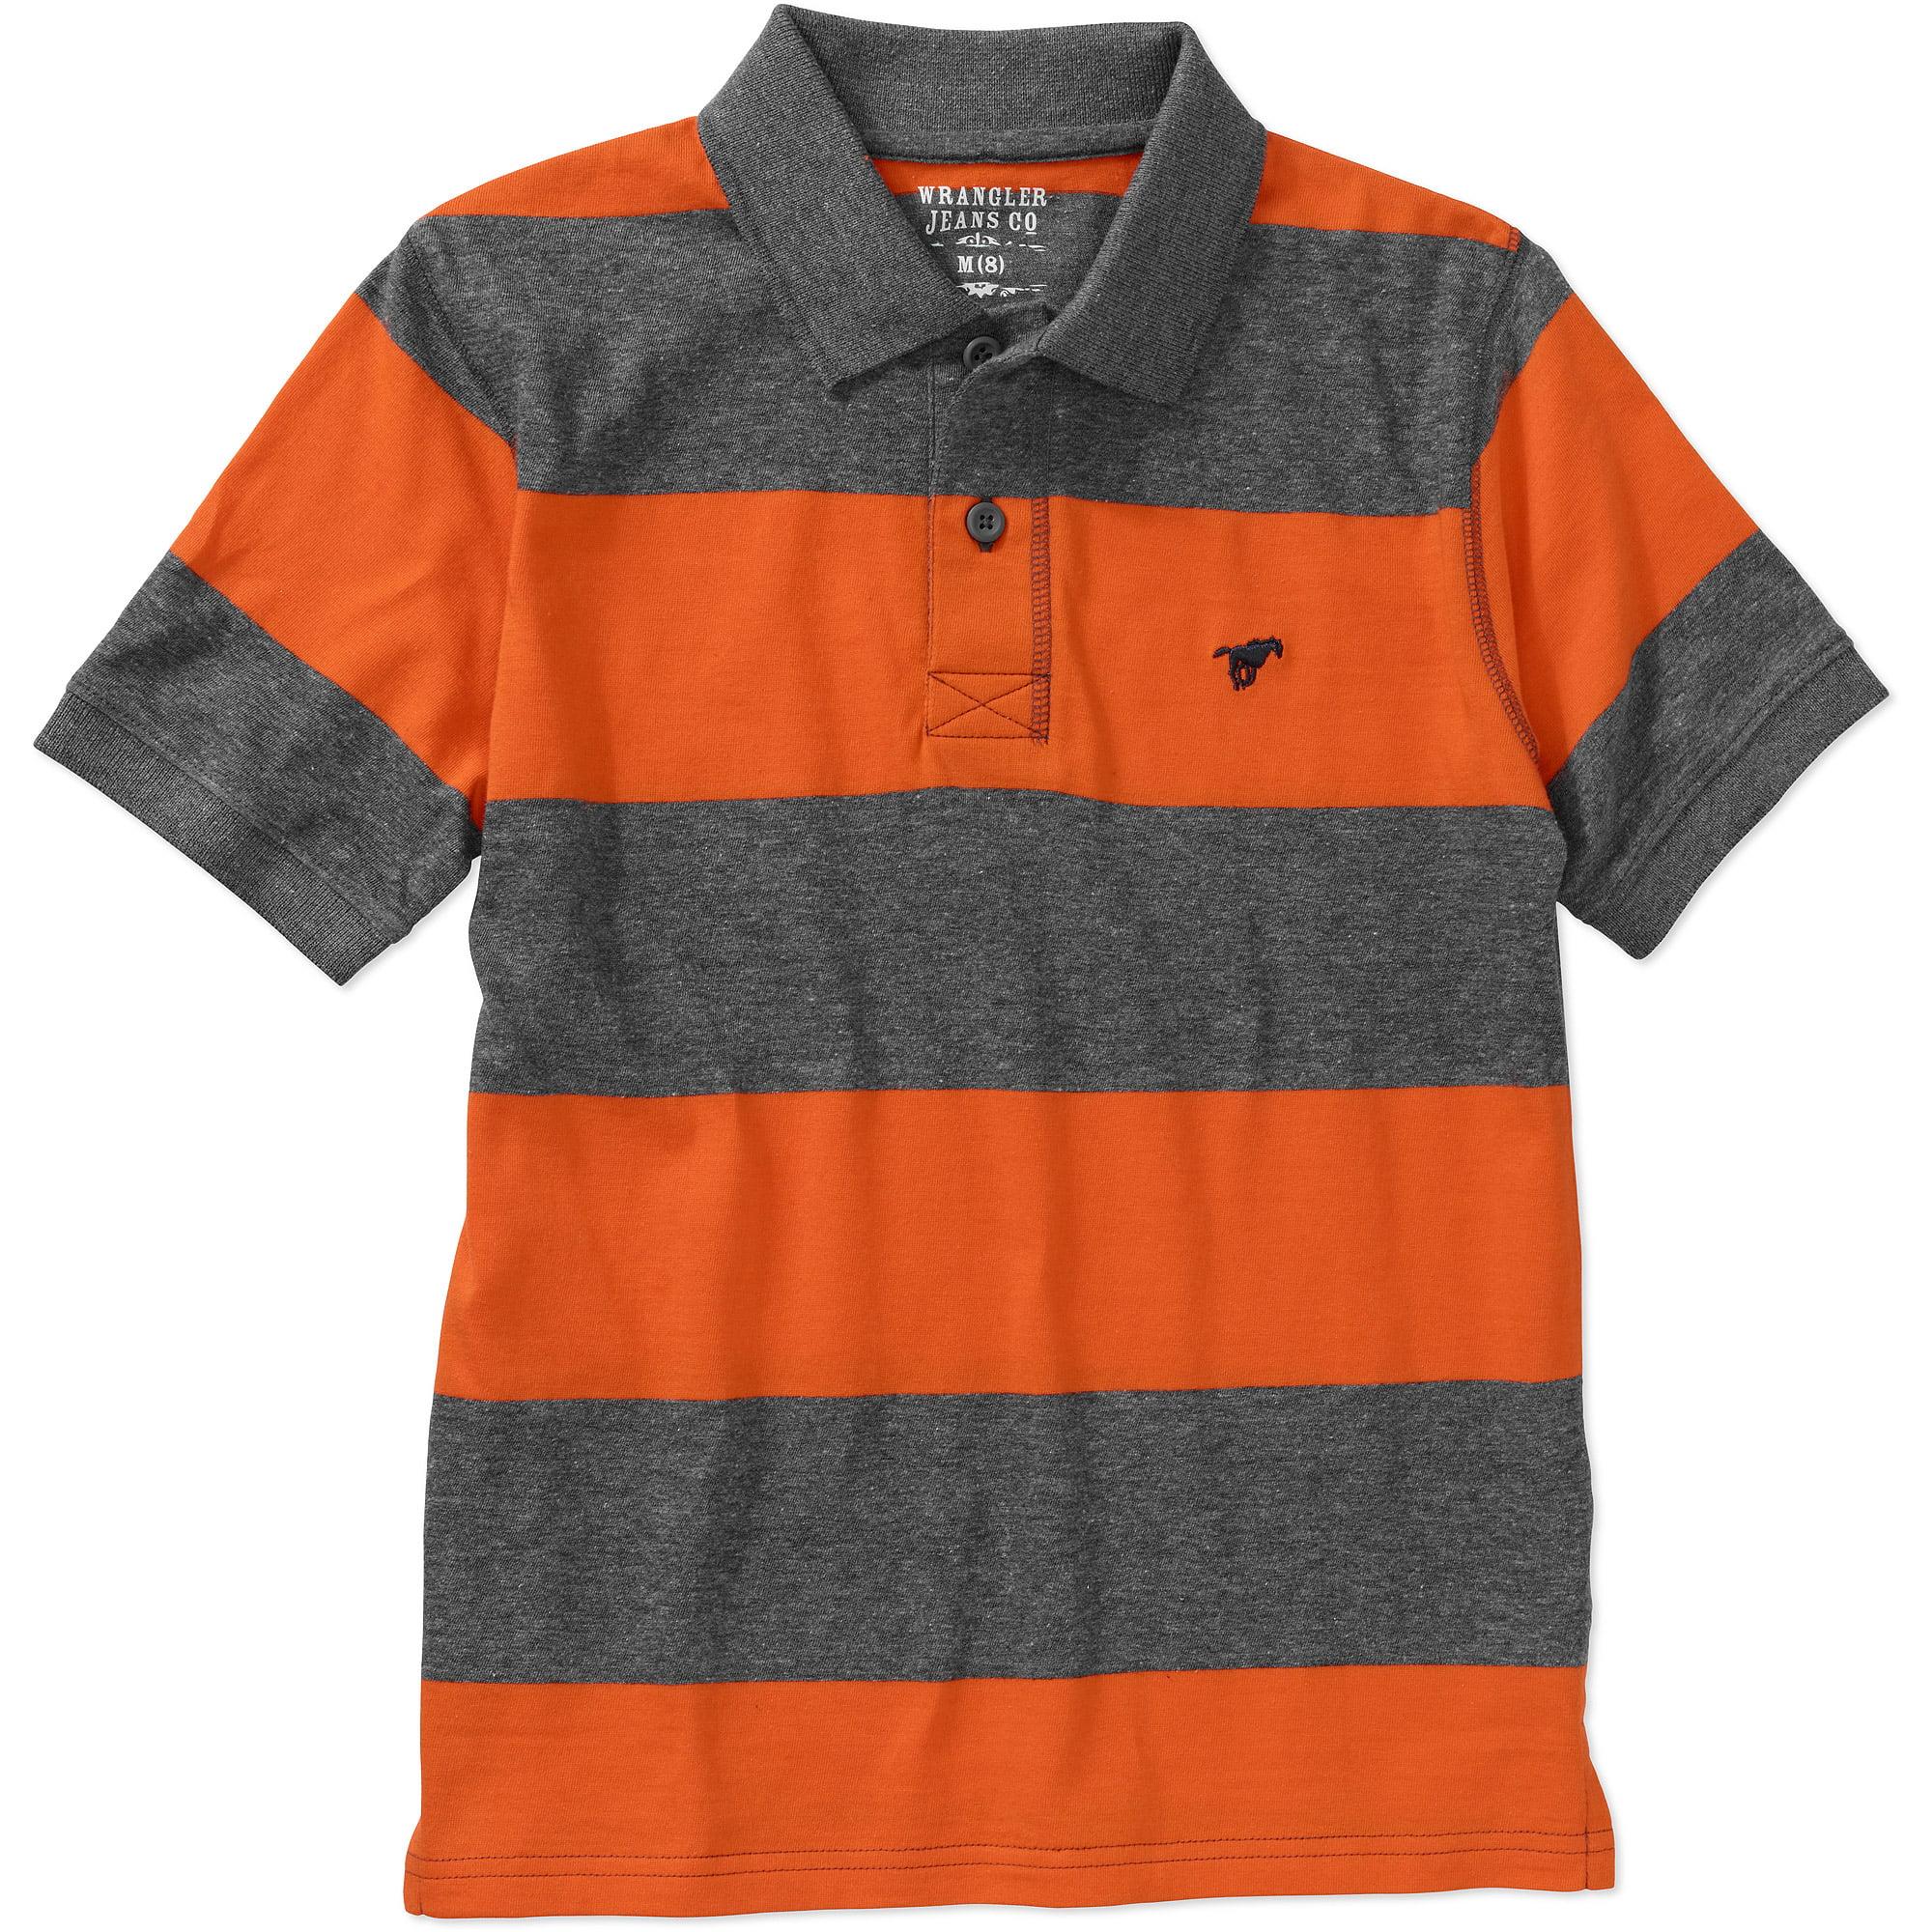 Wrangler Boys' Short Sleeve Rugby Stripe Polo